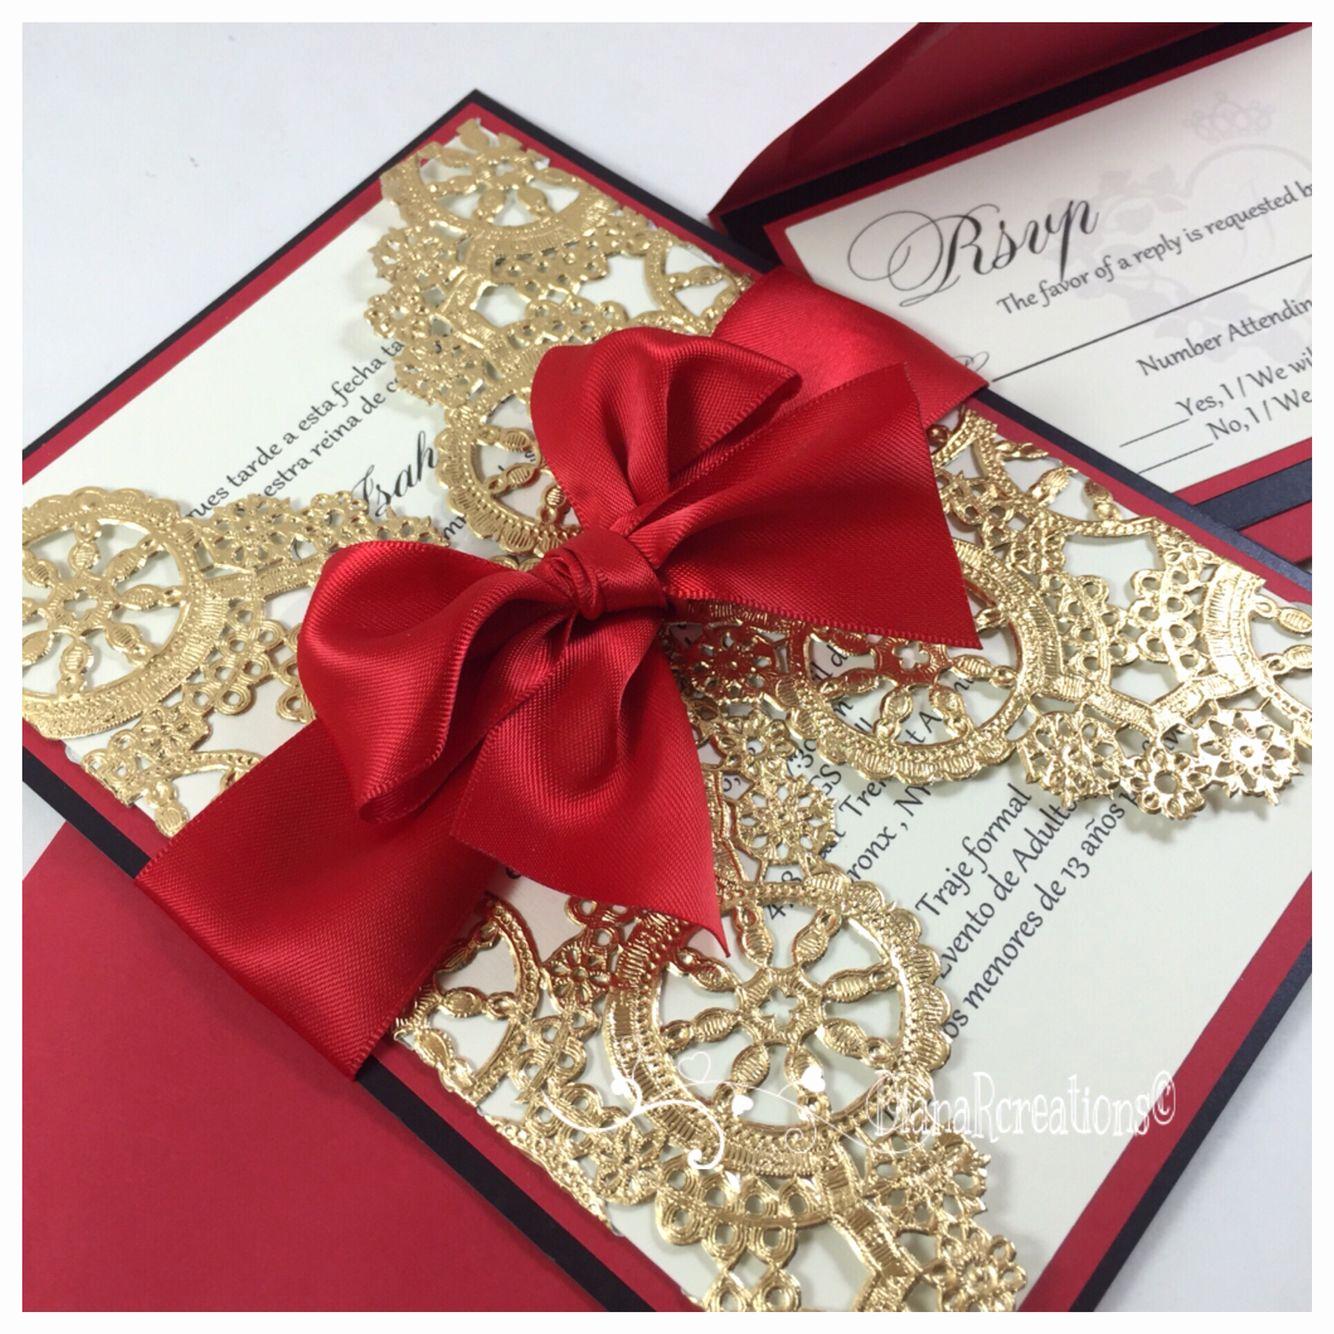 Invitation Ideas for Quinceanera Elegant Queens Of Heart Sweet Sixteen Invitations ️